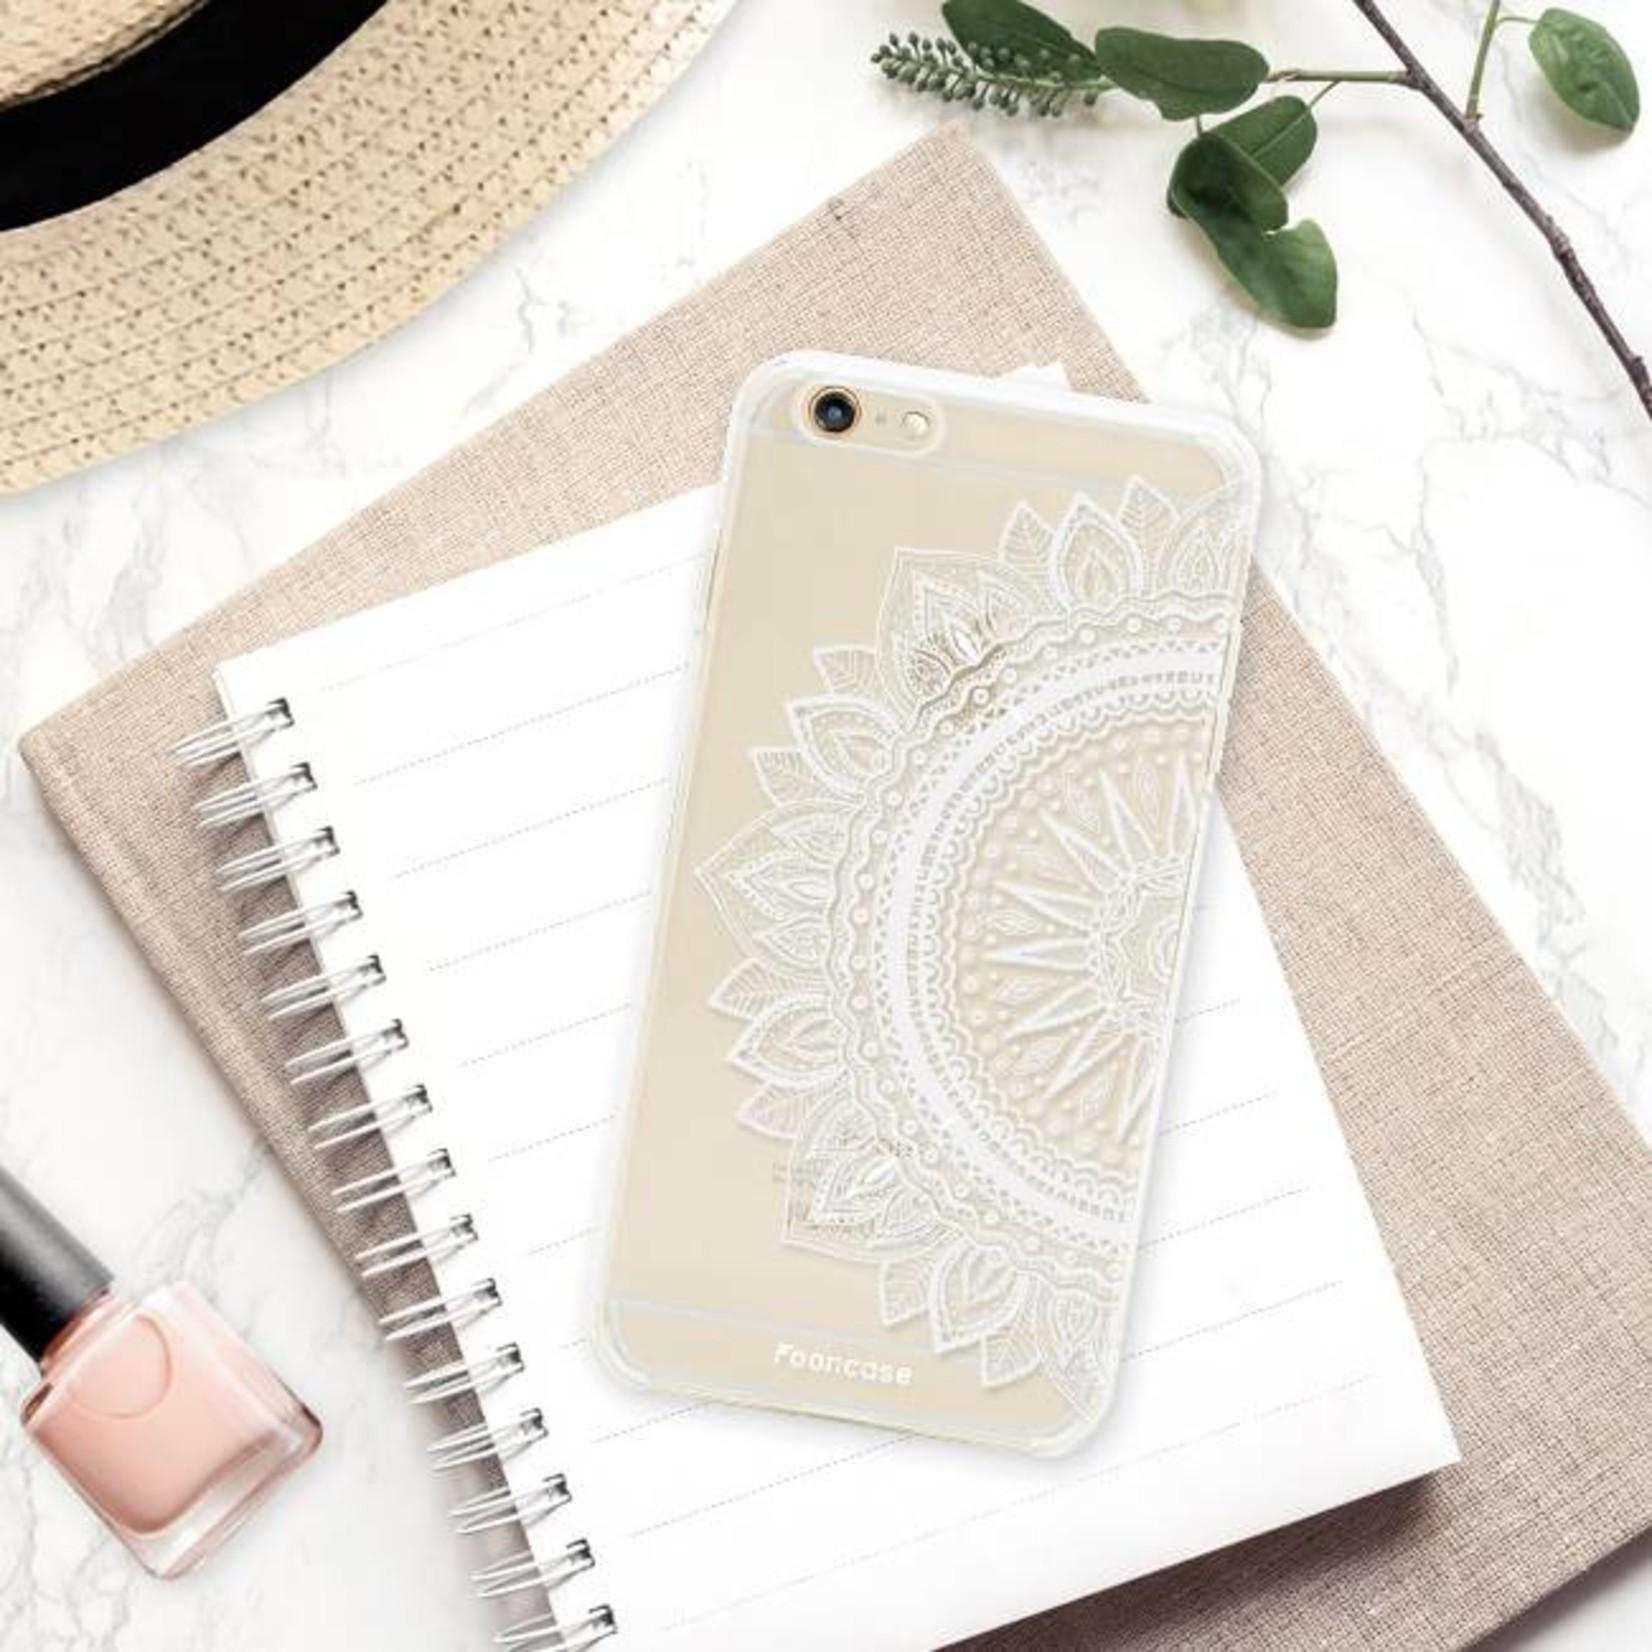 FOONCASE iPhone 6 / 6S hoesje TPU Soft Case - Back Cover - Mandala / Ibiza